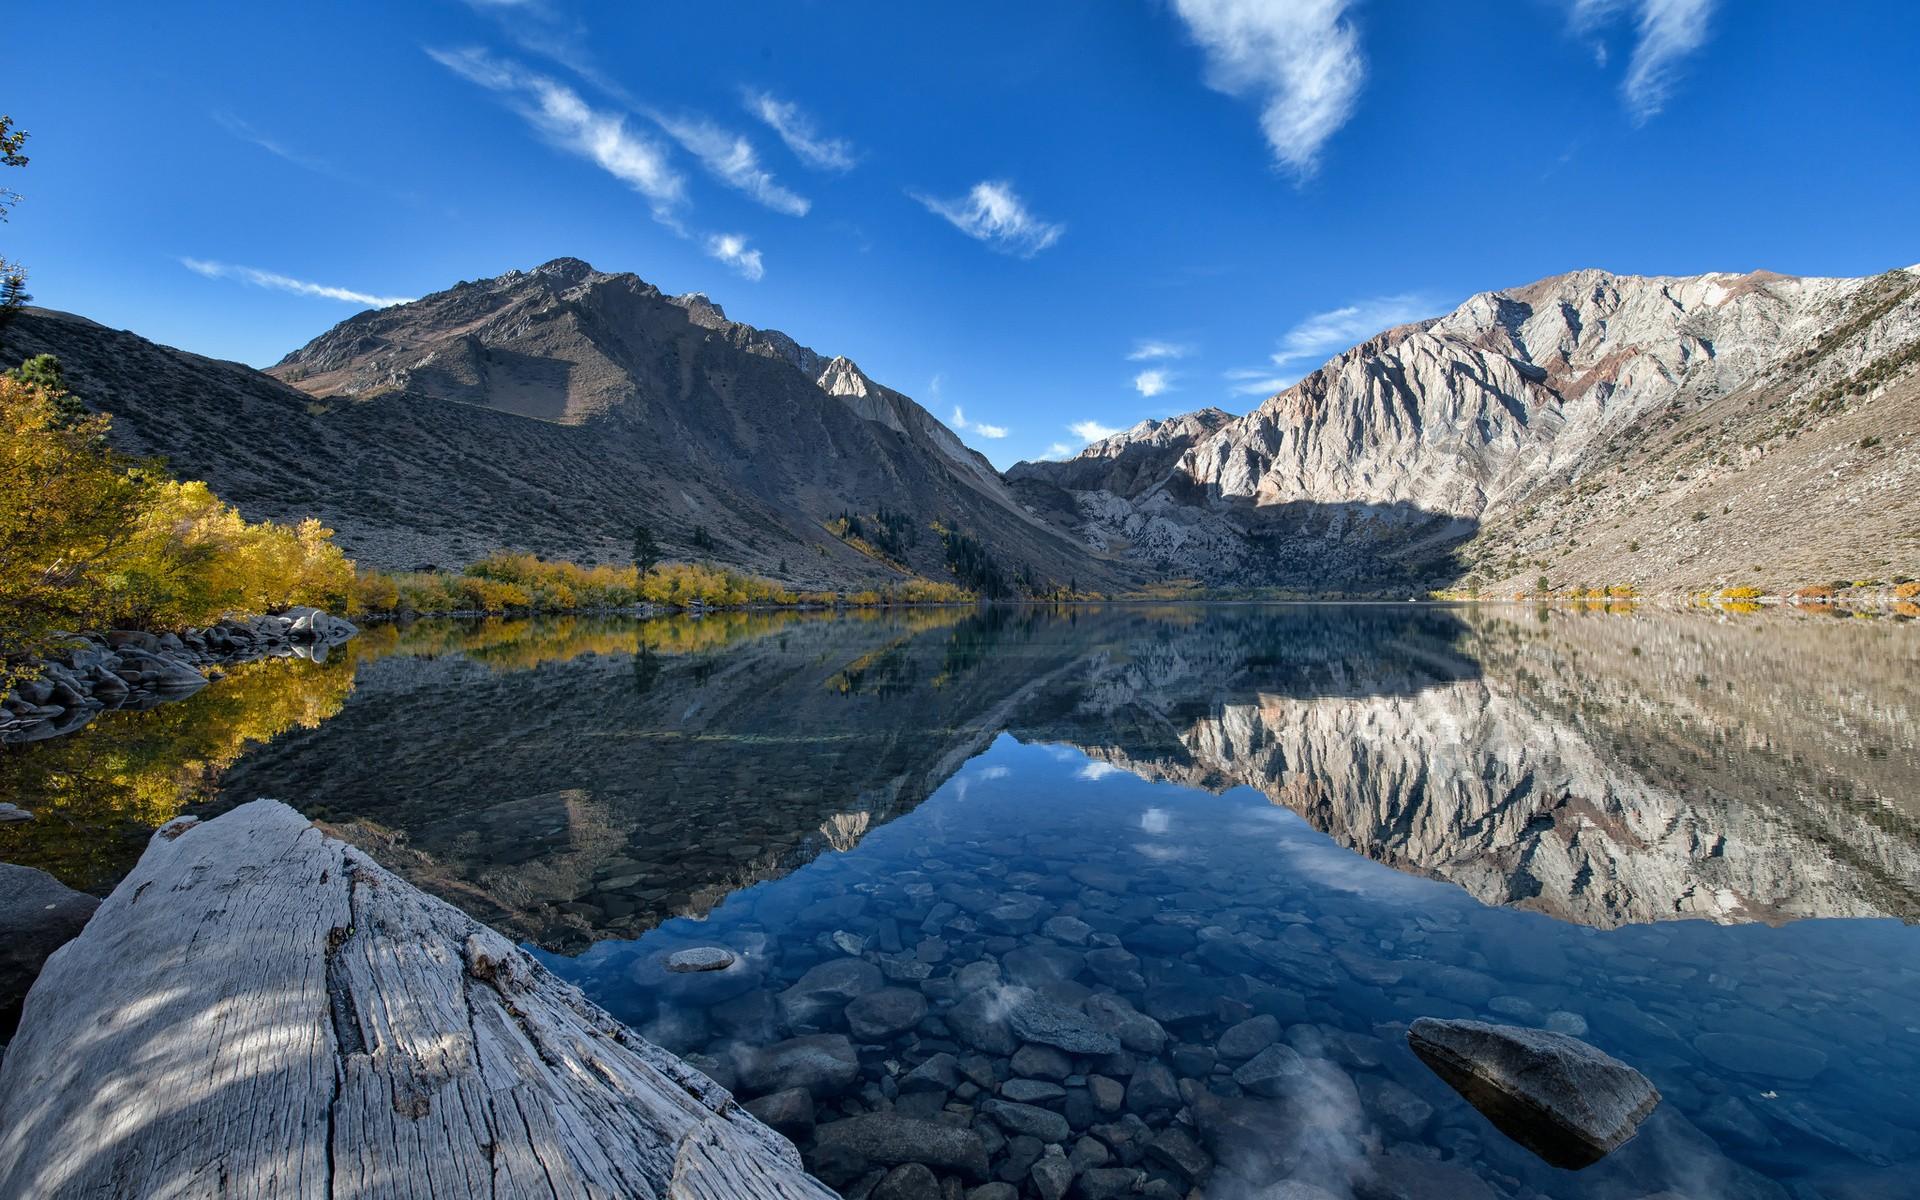 General 1920x1200 landscape nature lake reflection mountains Sierra Nevada California